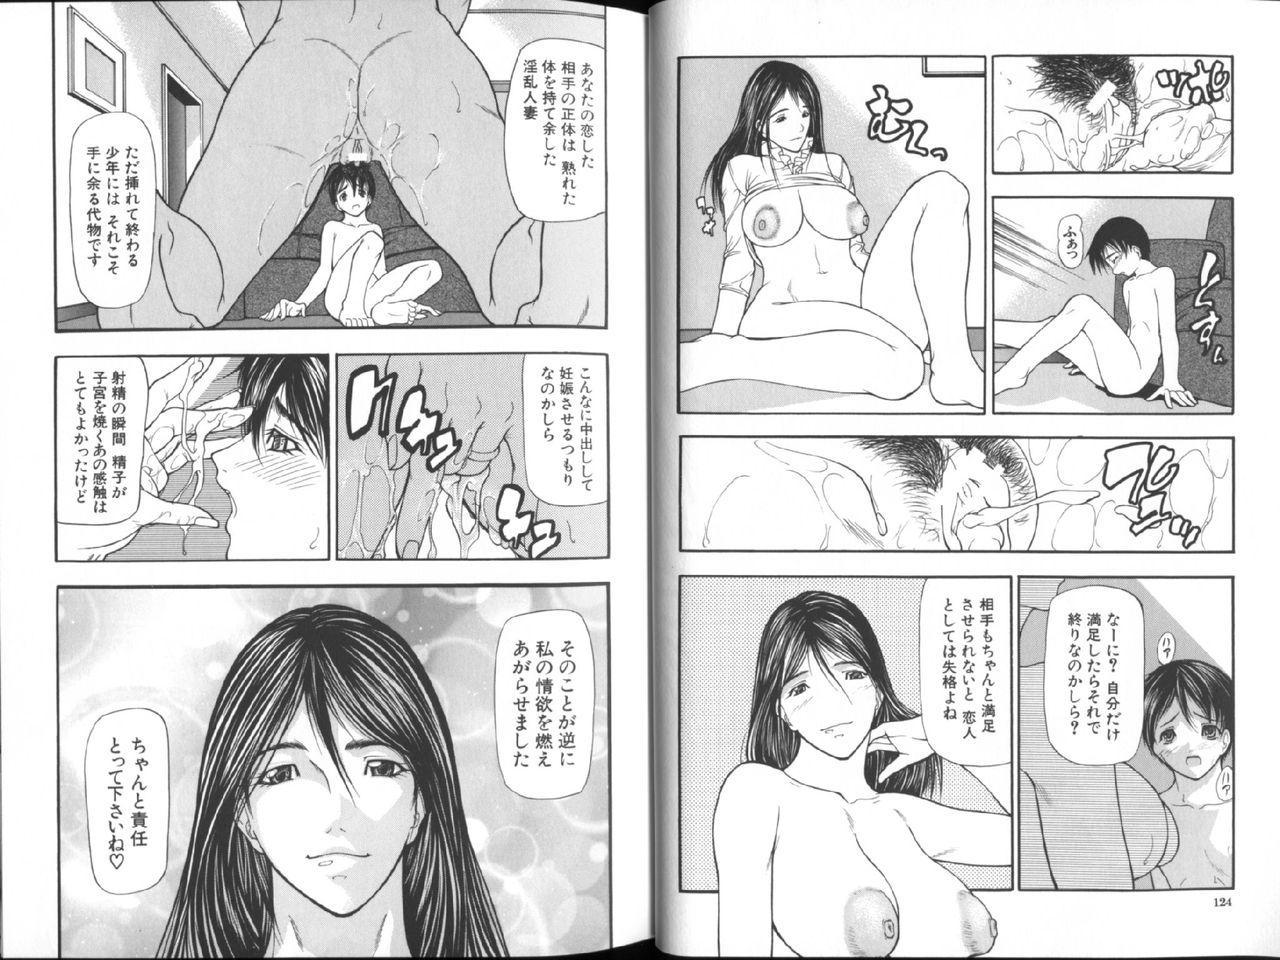 Senjou - A Desire is Instigated 63